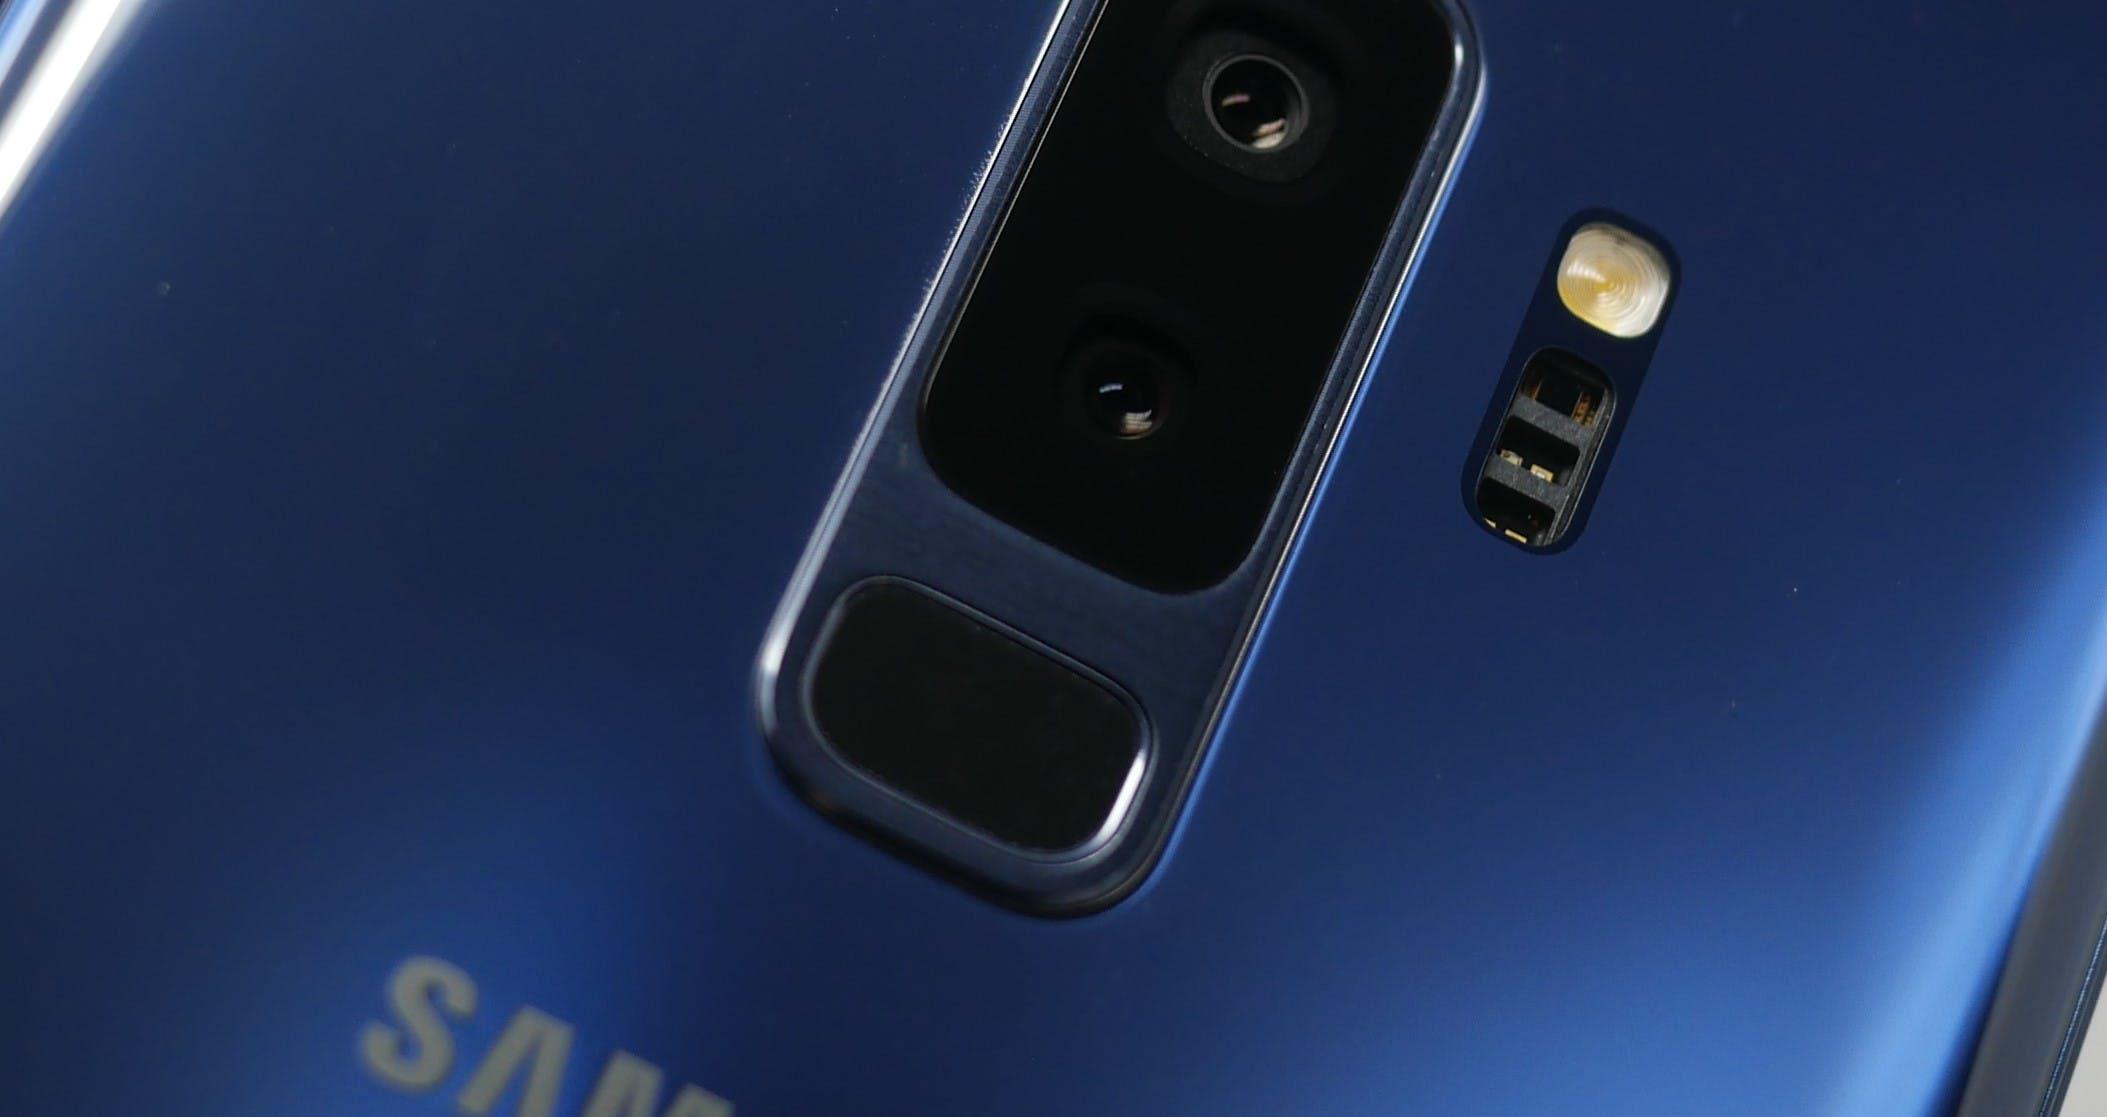 samsung galaxy s9+ camera module dual-lens fingerprint sensor